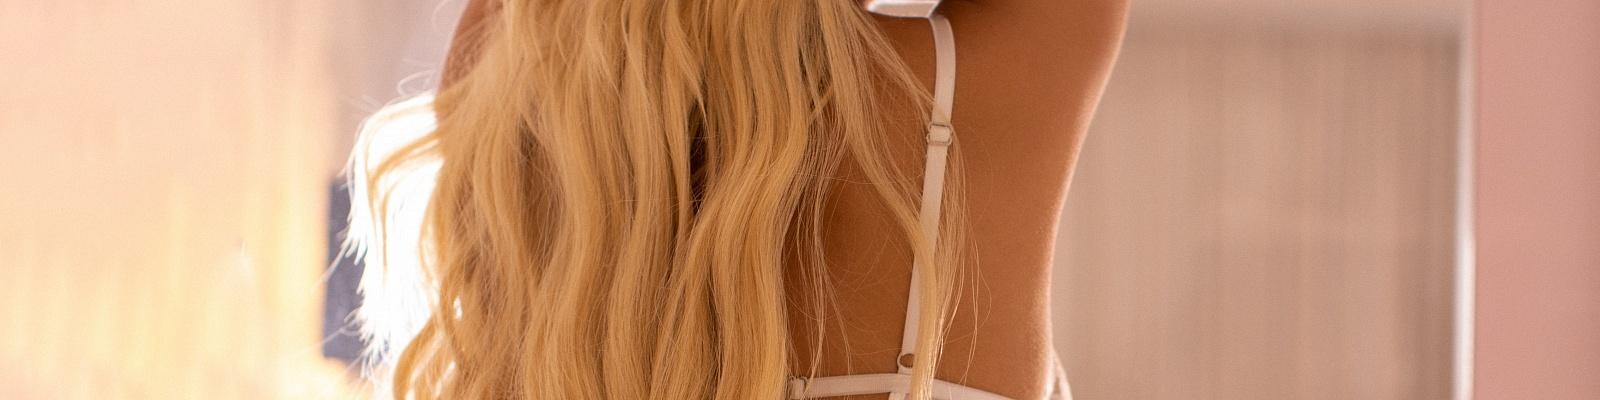 Rafaella Capri's Cover Photo